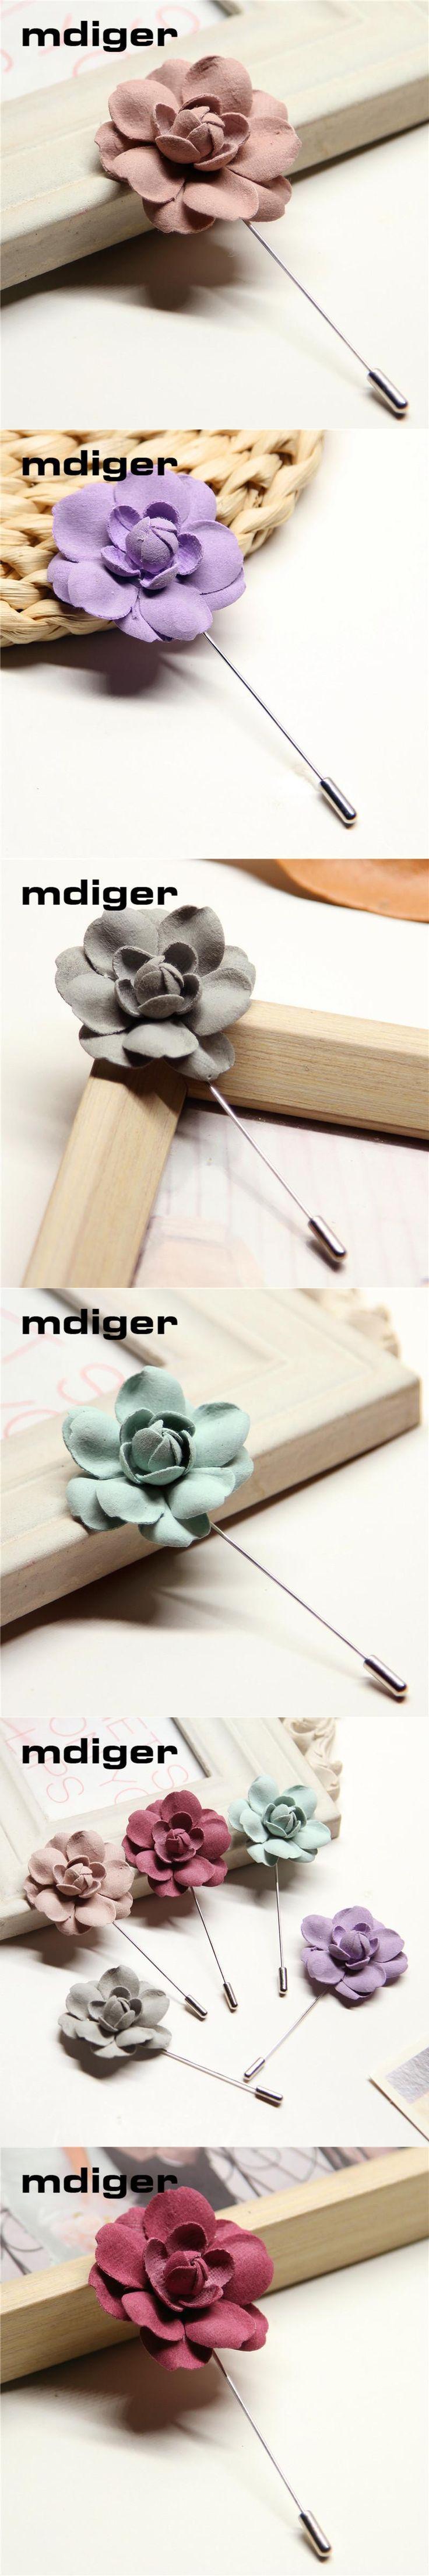 Mdiger Brand Mens Lapel Pin Flower Wedding Brooch Bouquet for Men Handmade Brooches Christmas Gift